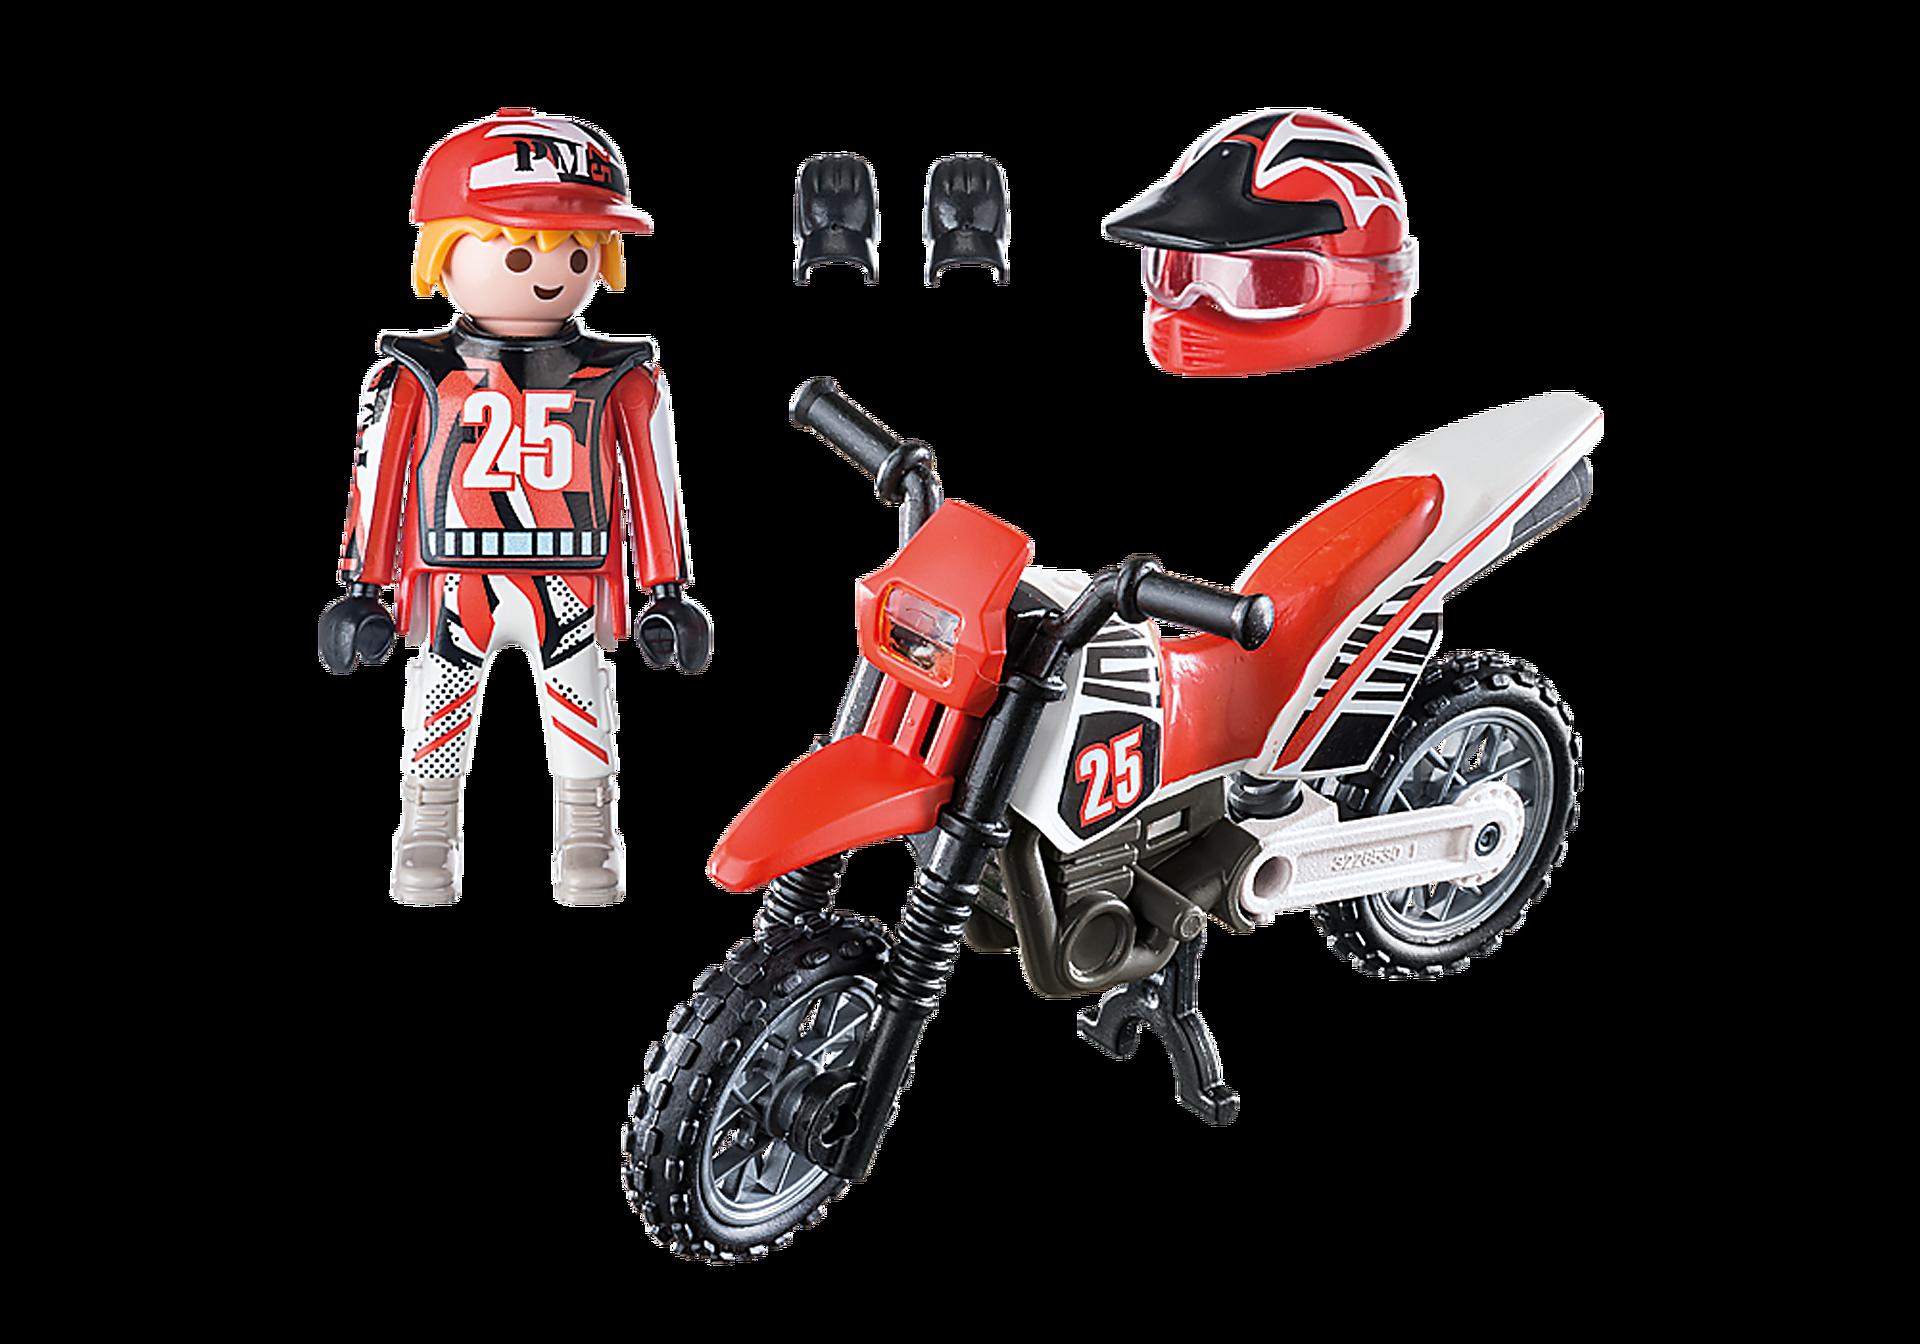 9357 Motocrossförare zoom image4